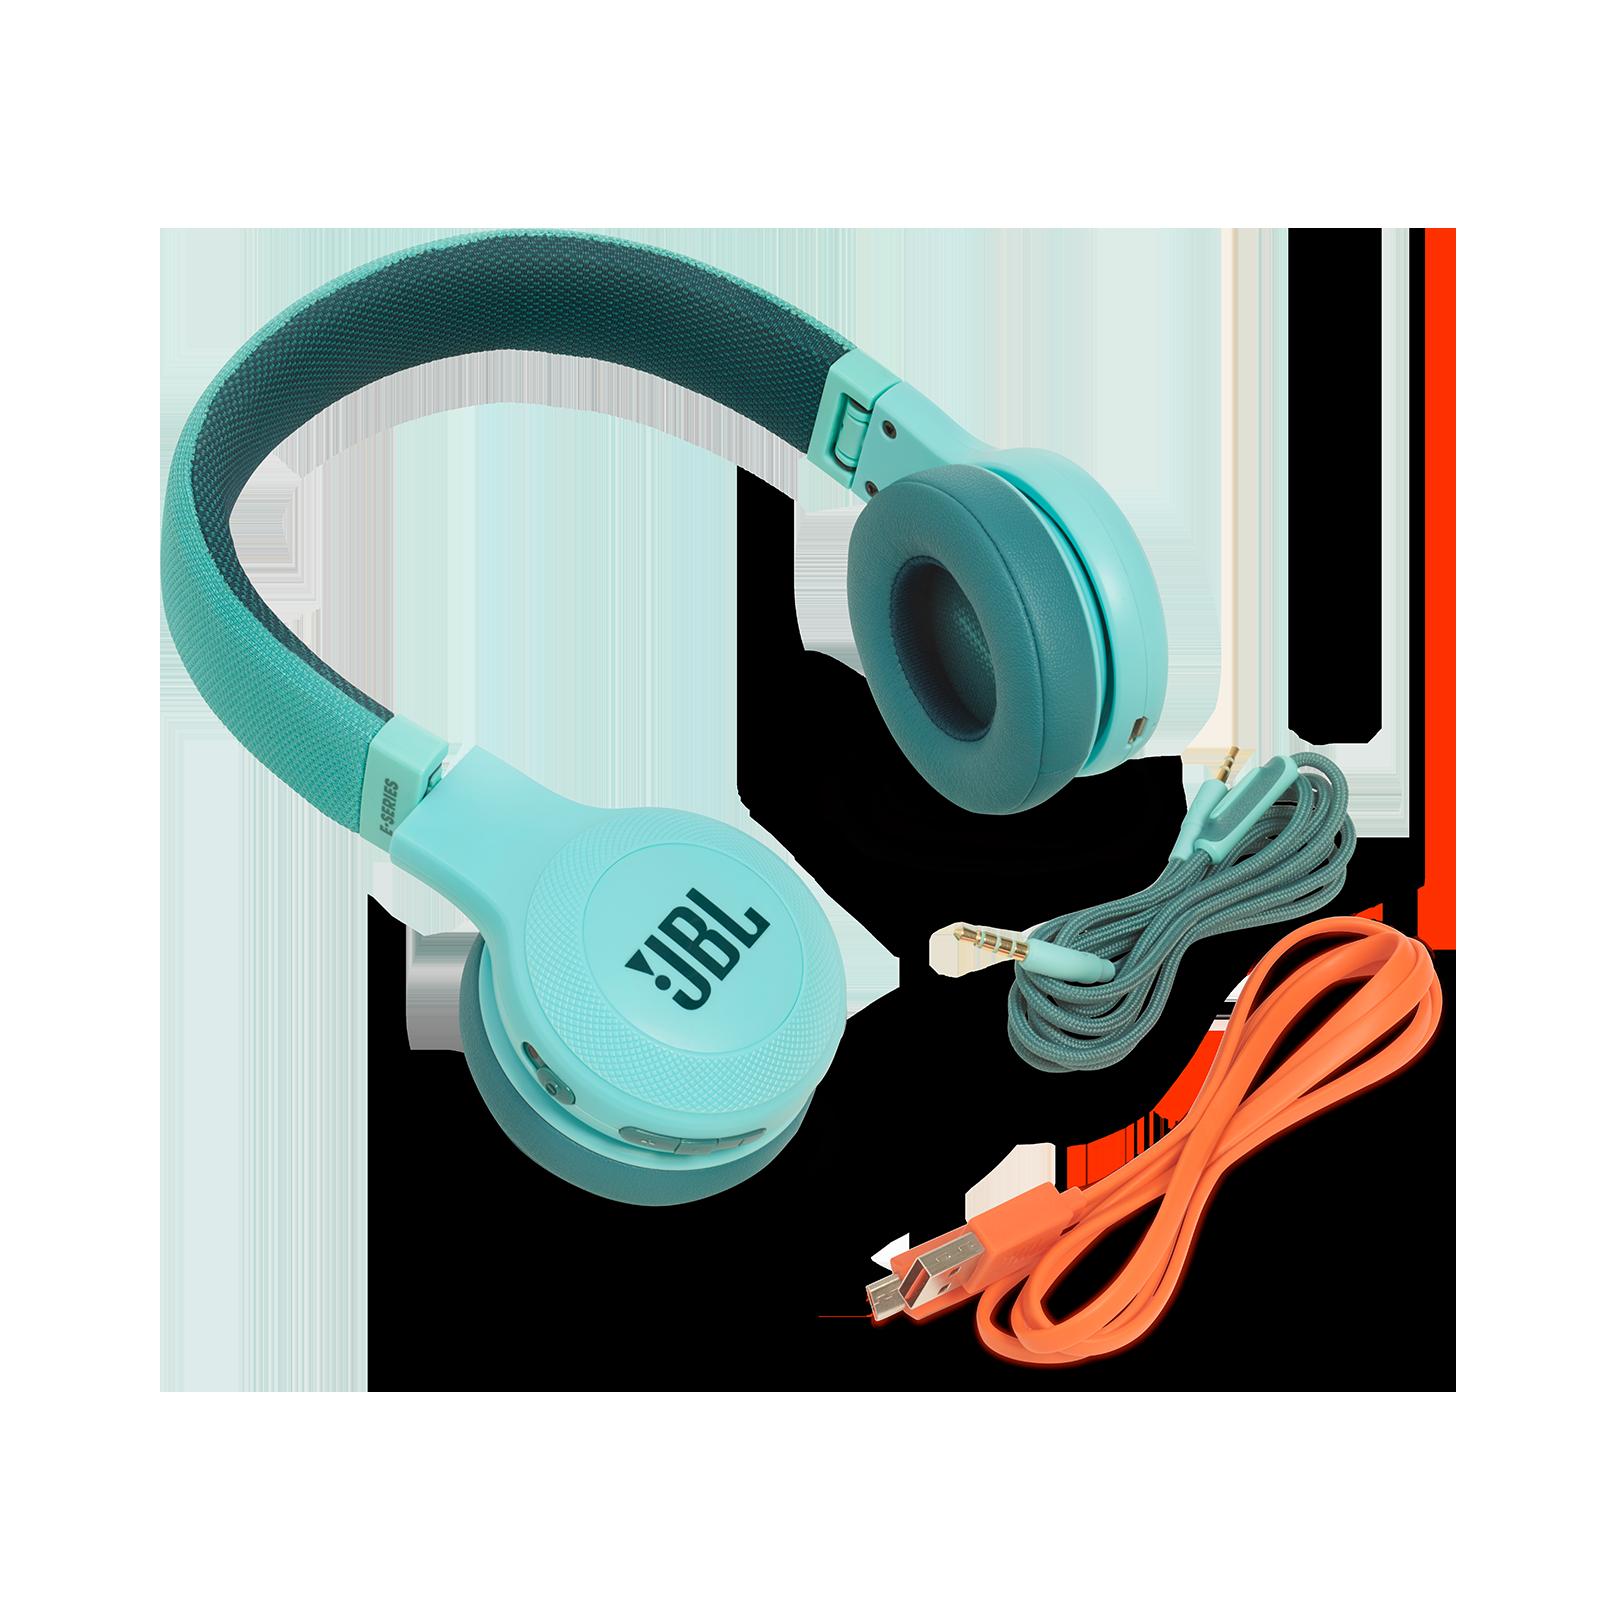 JBL E45BT - Teal - Wireless on-ear headphones - Detailshot 4